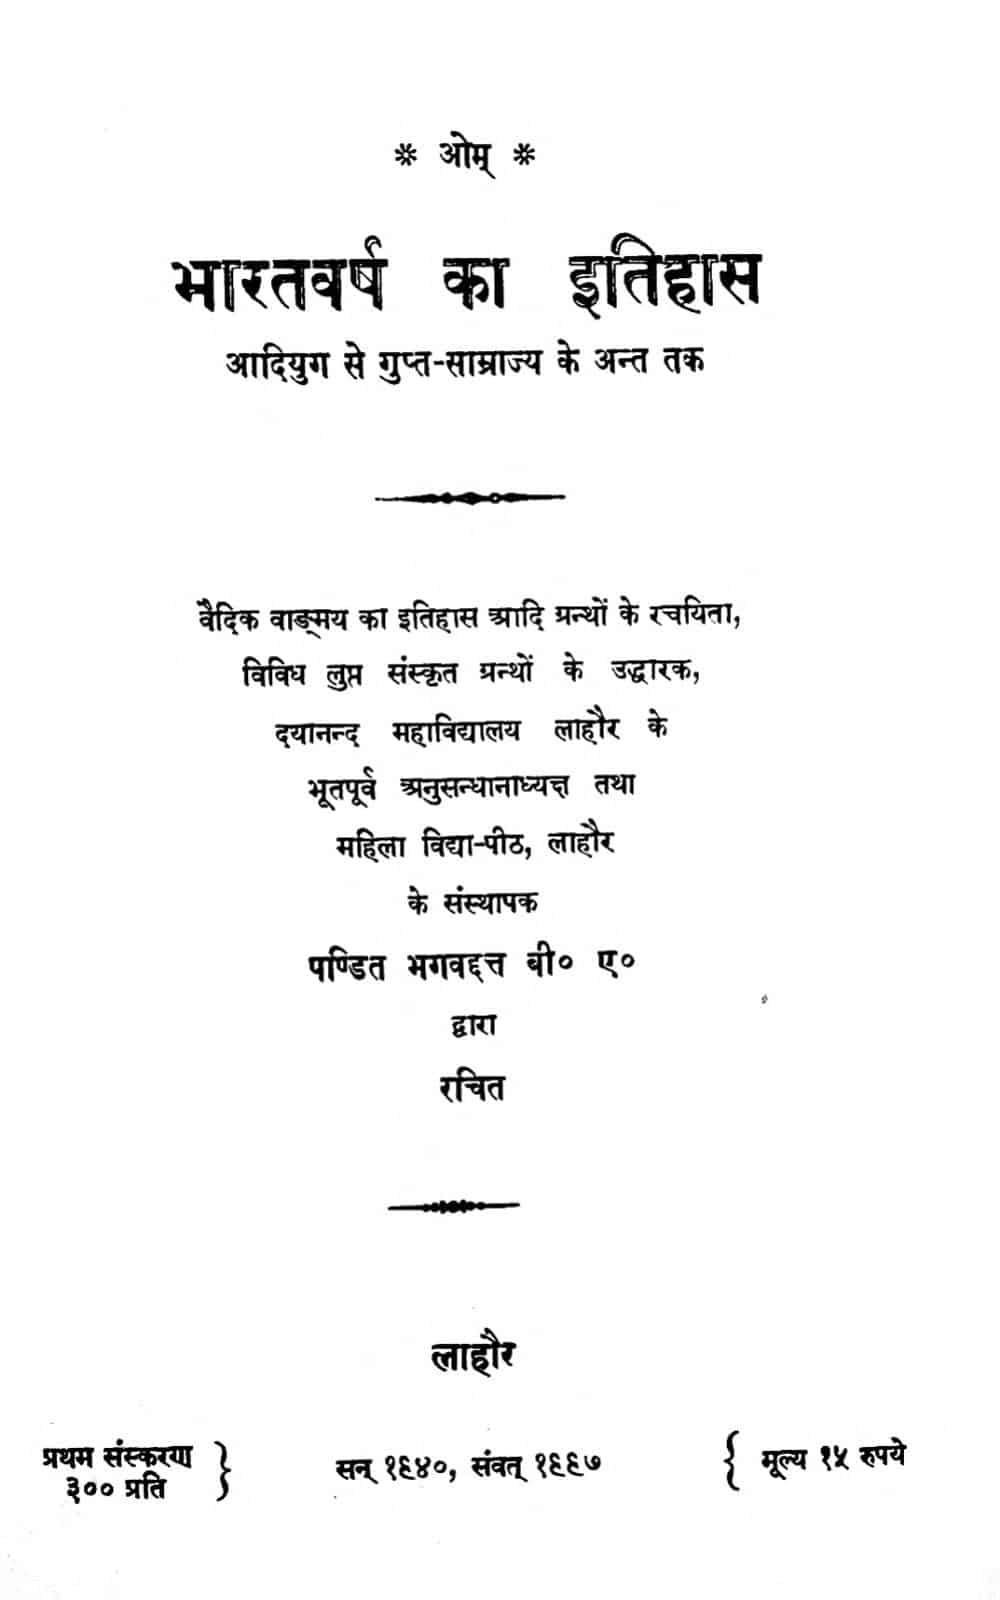 Book Image : भारत वर्ष का इतिहास  - Bharat Varsh Ka Itihas